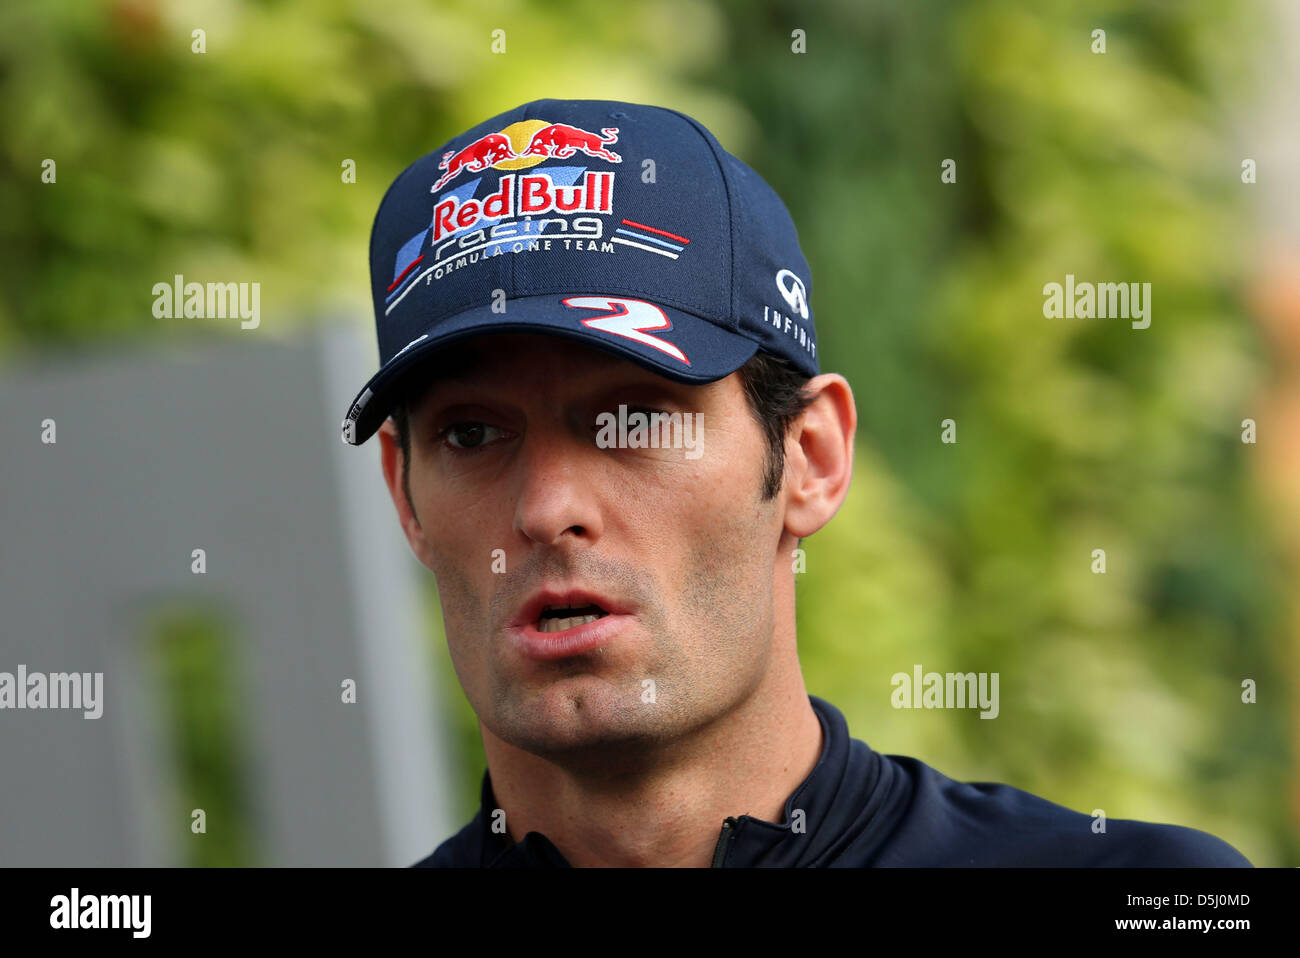 79e806eb5e2 Australian Formula One driver Mark Webber of Red Bull seen in the paddock  of the race track Marina-Bay-Street-Circuit